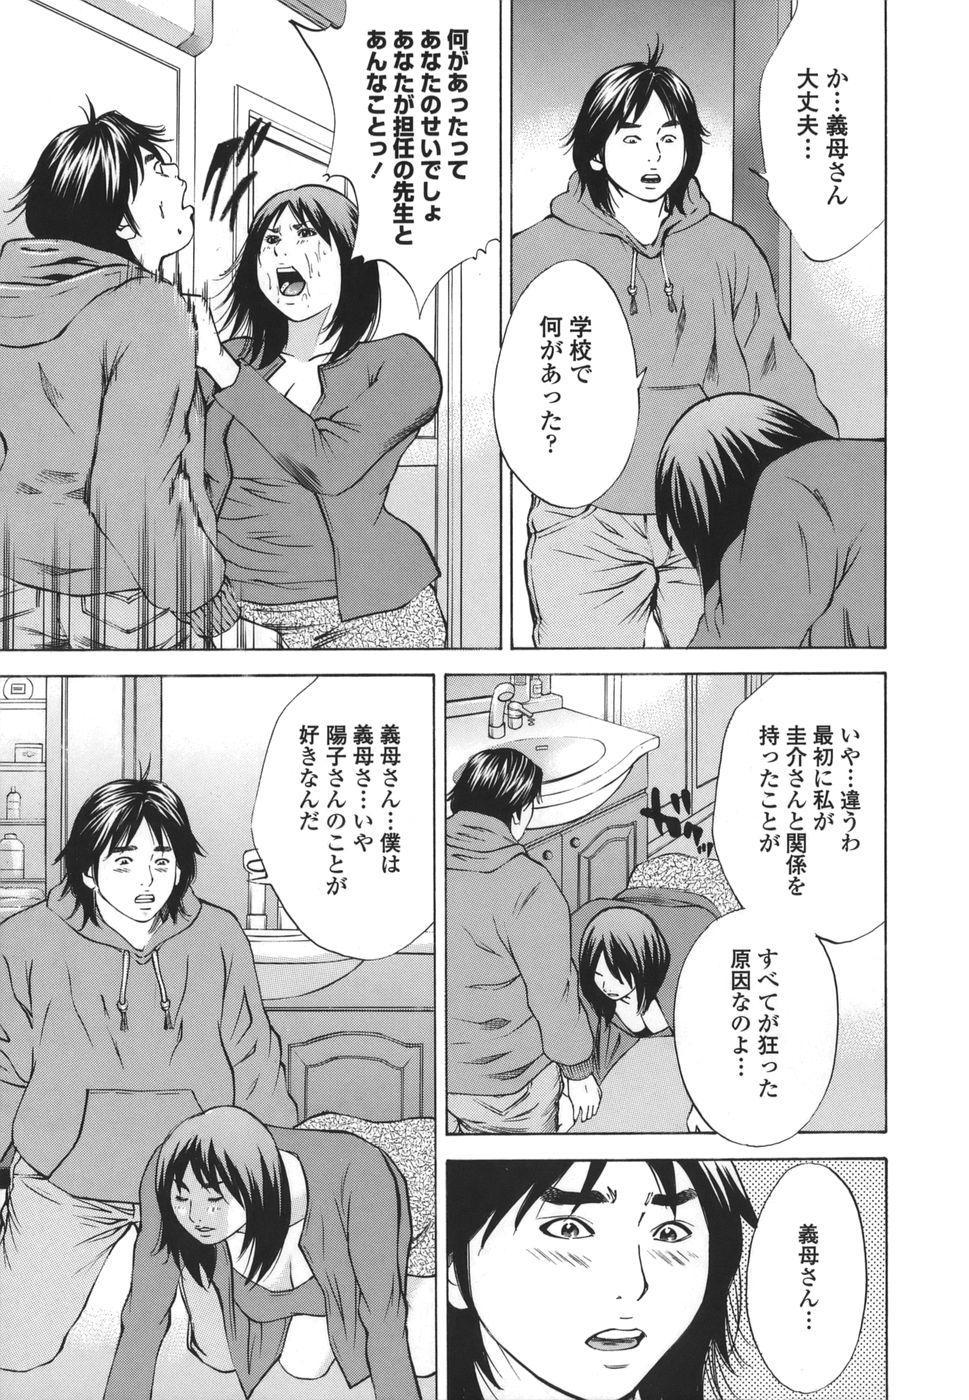 Kinshin Goukan - Near Relation Rapes 192